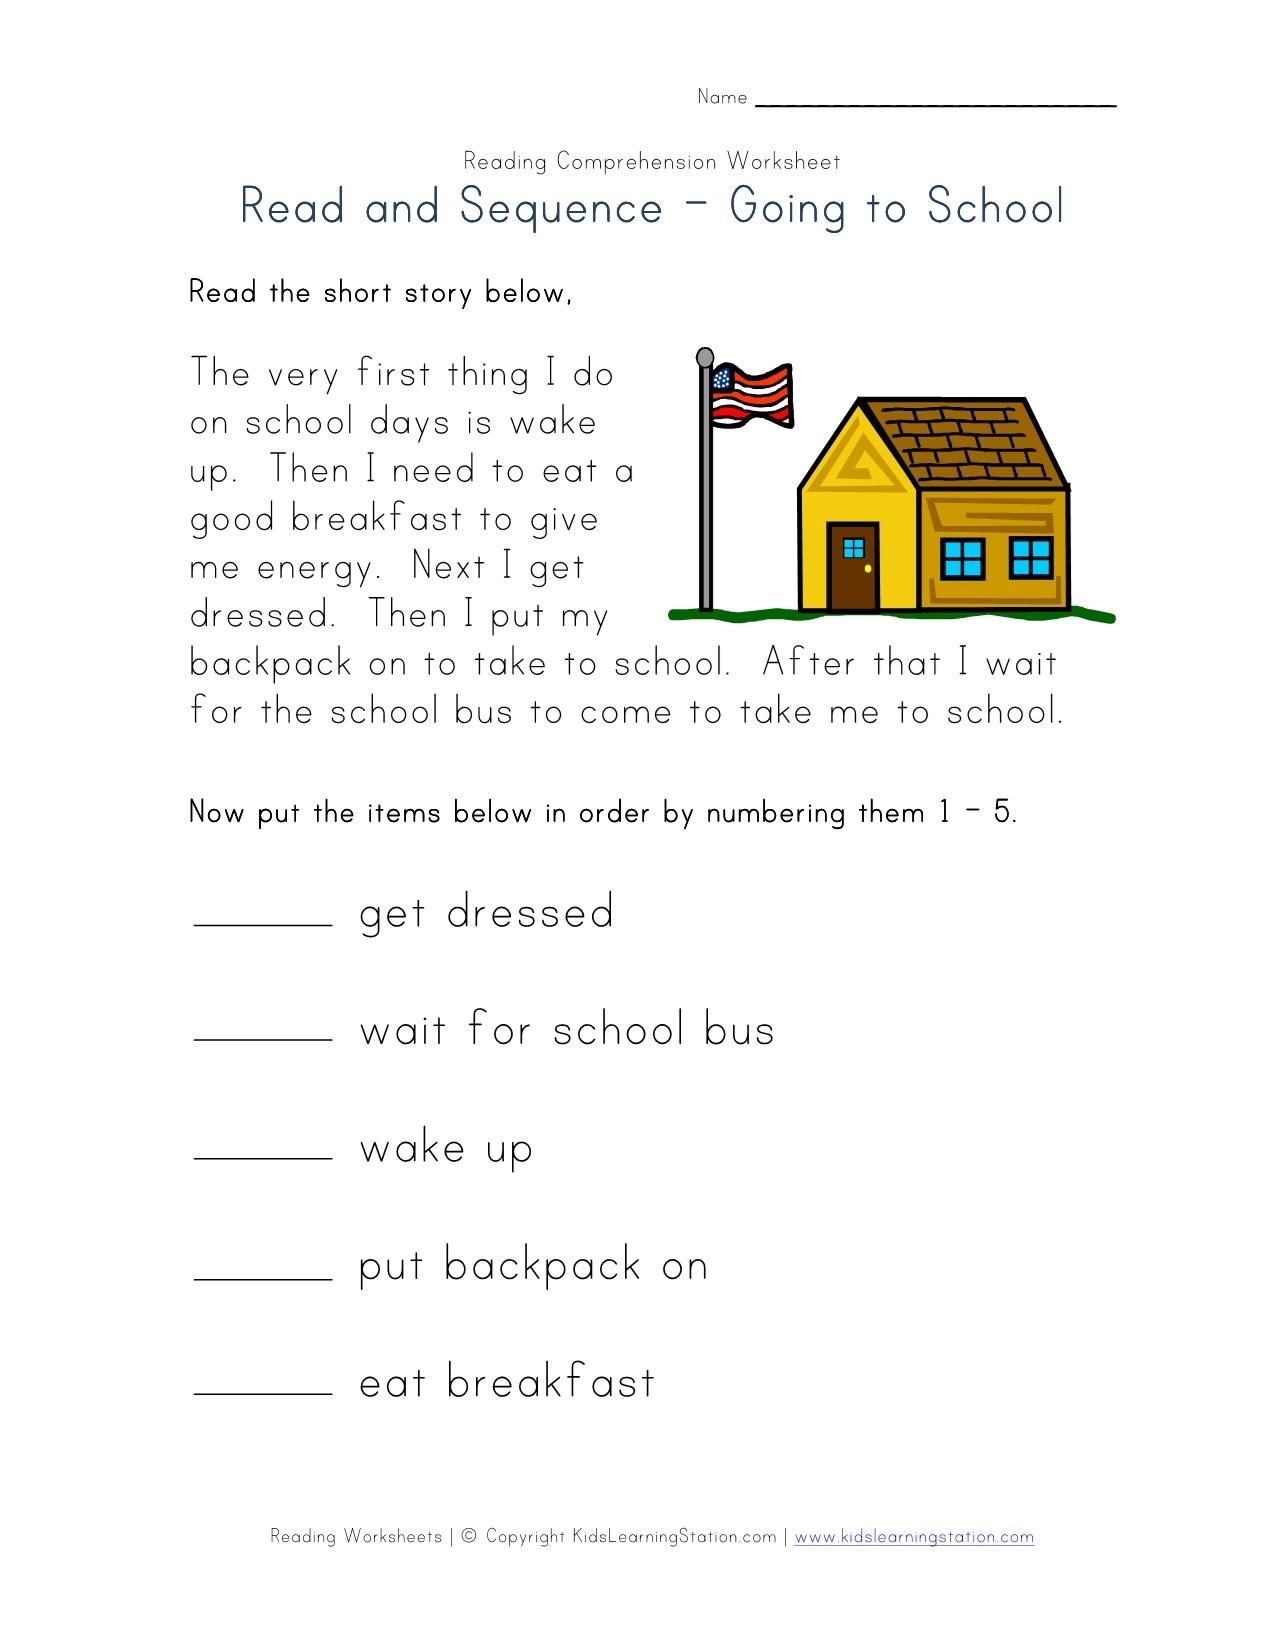 Ez School Worksheets : Pictures easy reading comprehension worksheets leafsea